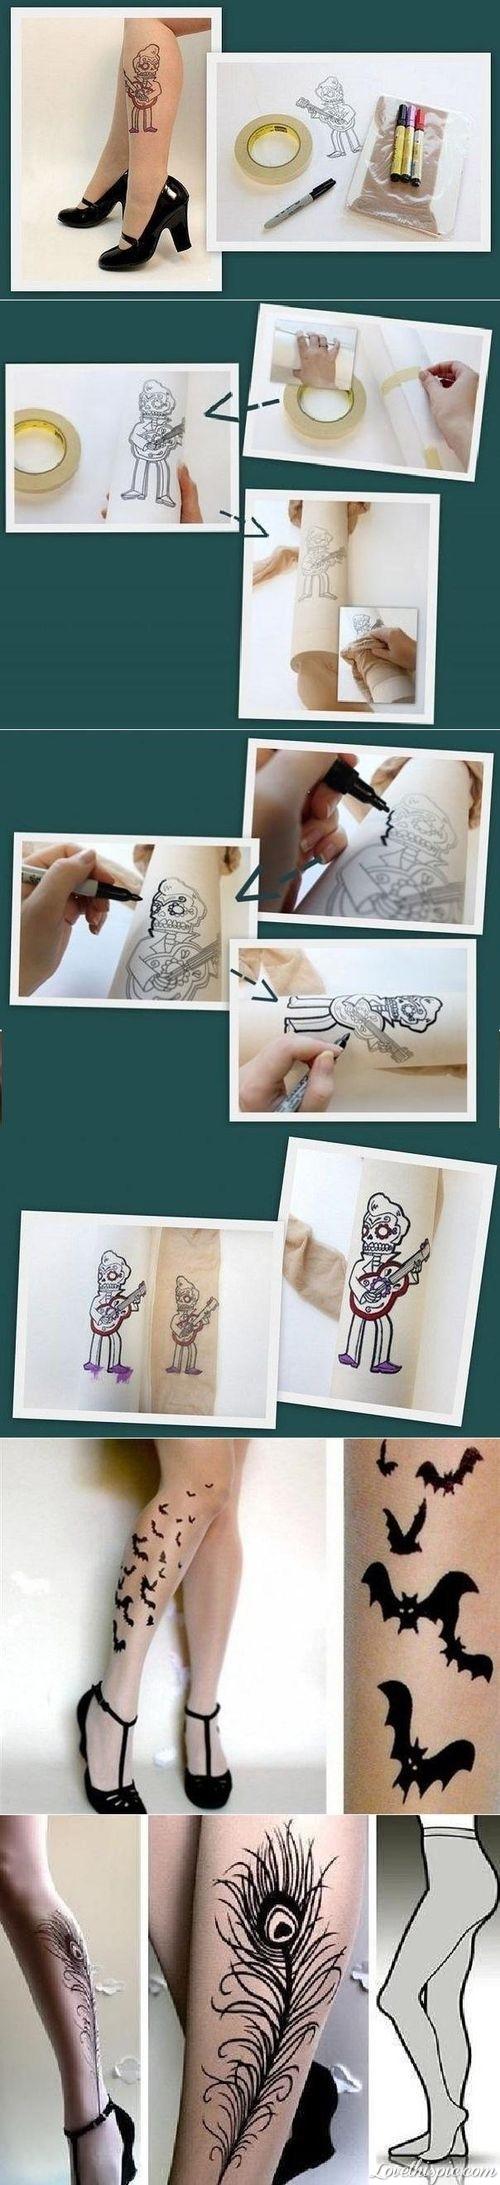 DIY Pantyhose Tattoo  diy crafts easy crafts easy diy diy tattoo. diy clothes craft tattoos